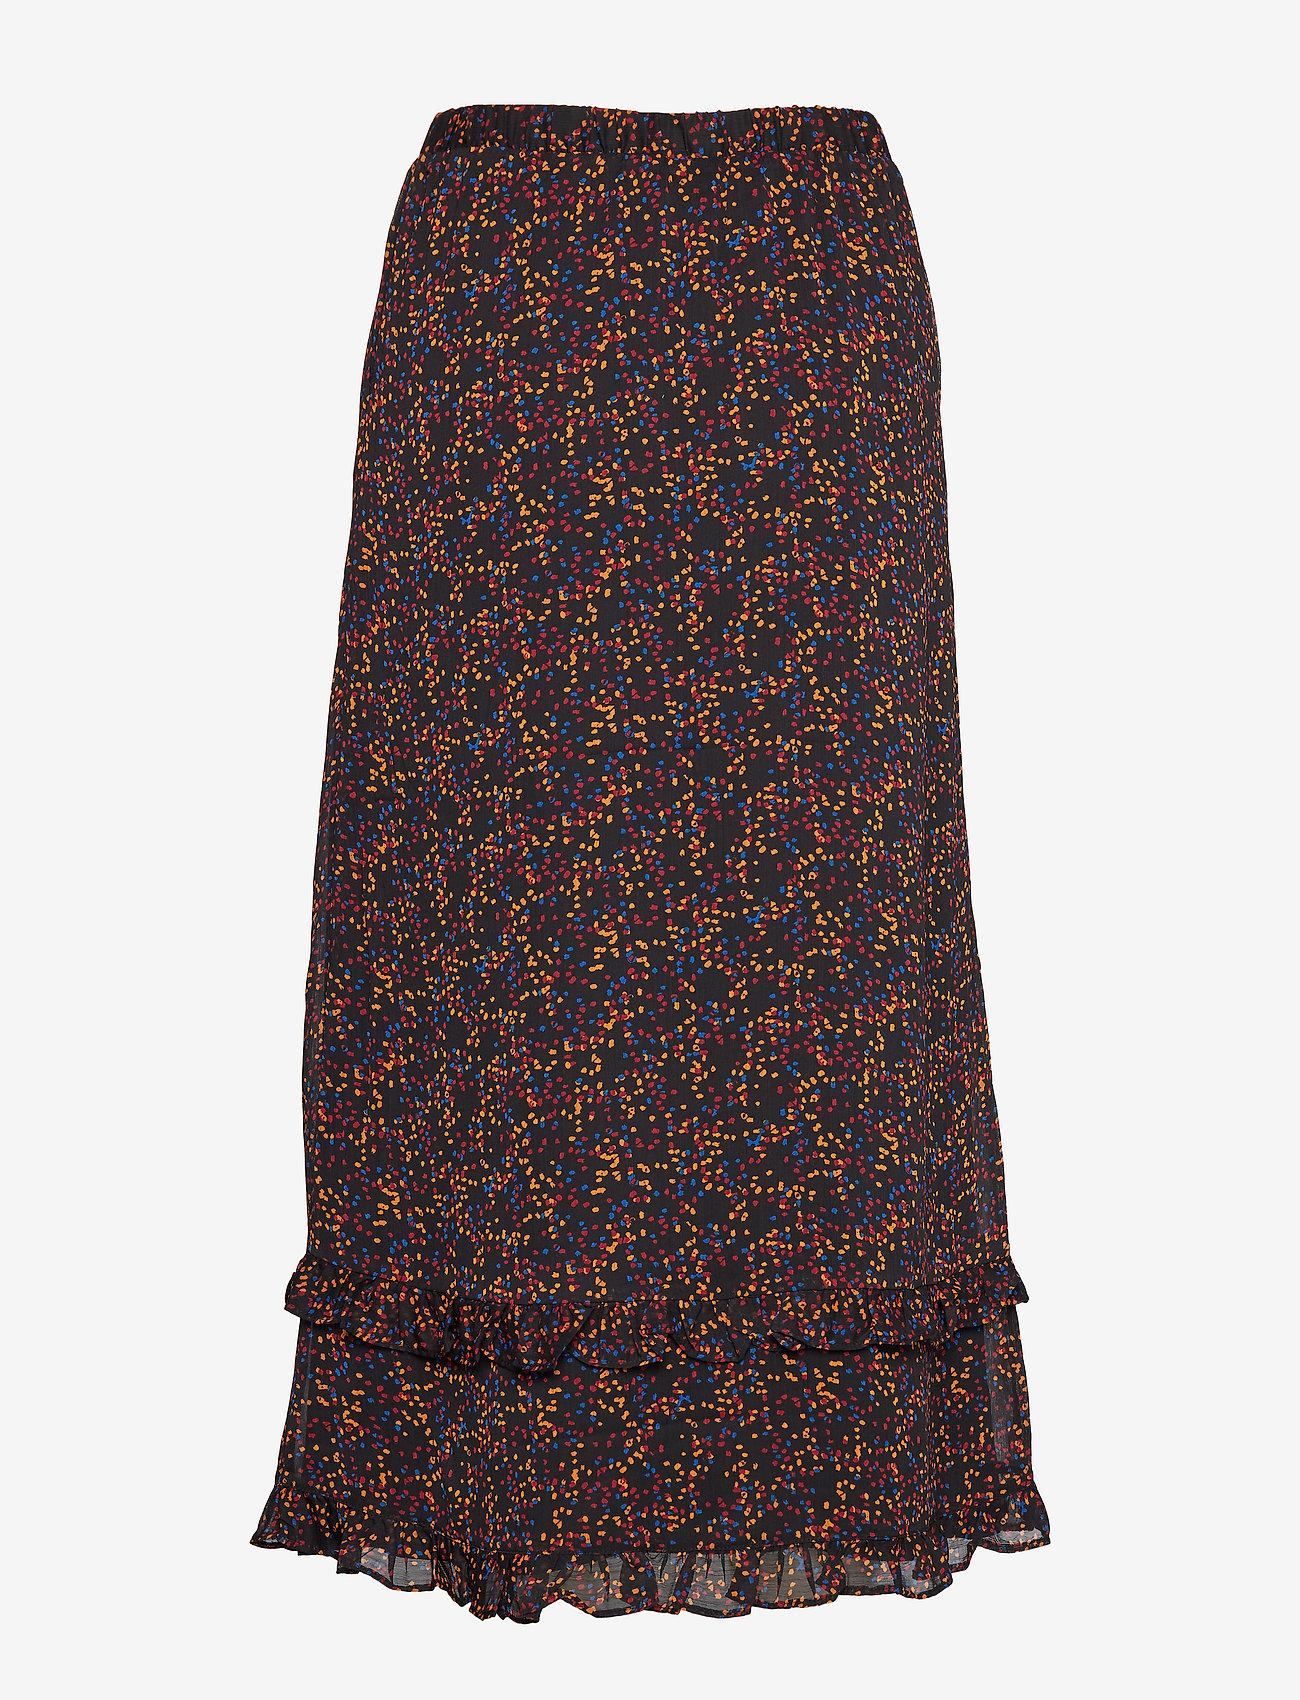 Gestuz - AlminaGZ skirt MA19 - midi - black multi dot